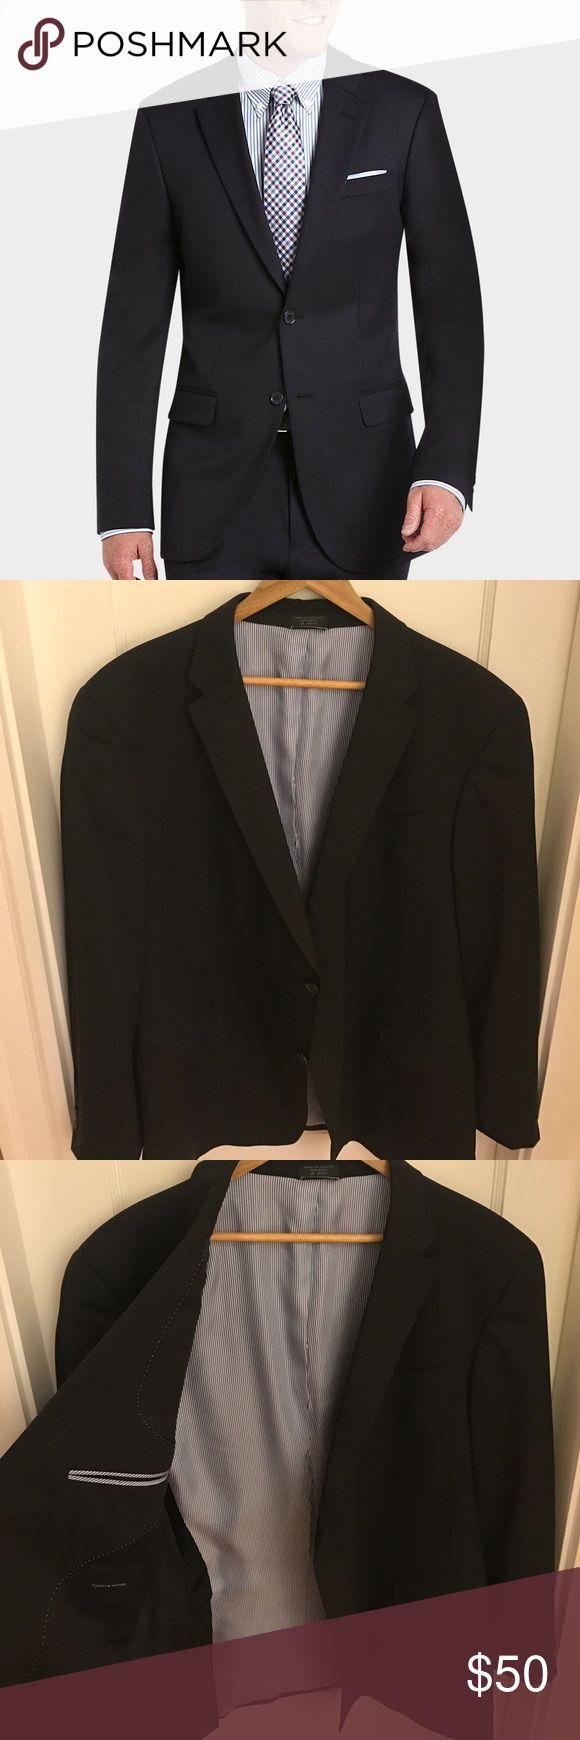 Tommy Hilfiger black suit jacket Tommy Hilfiger modern fit black suit jacket separate.100% wool. 2 button closure. Notched label. Only worn once. Tommy Hilfiger Suits & Blazers Sport Coats & Blazers